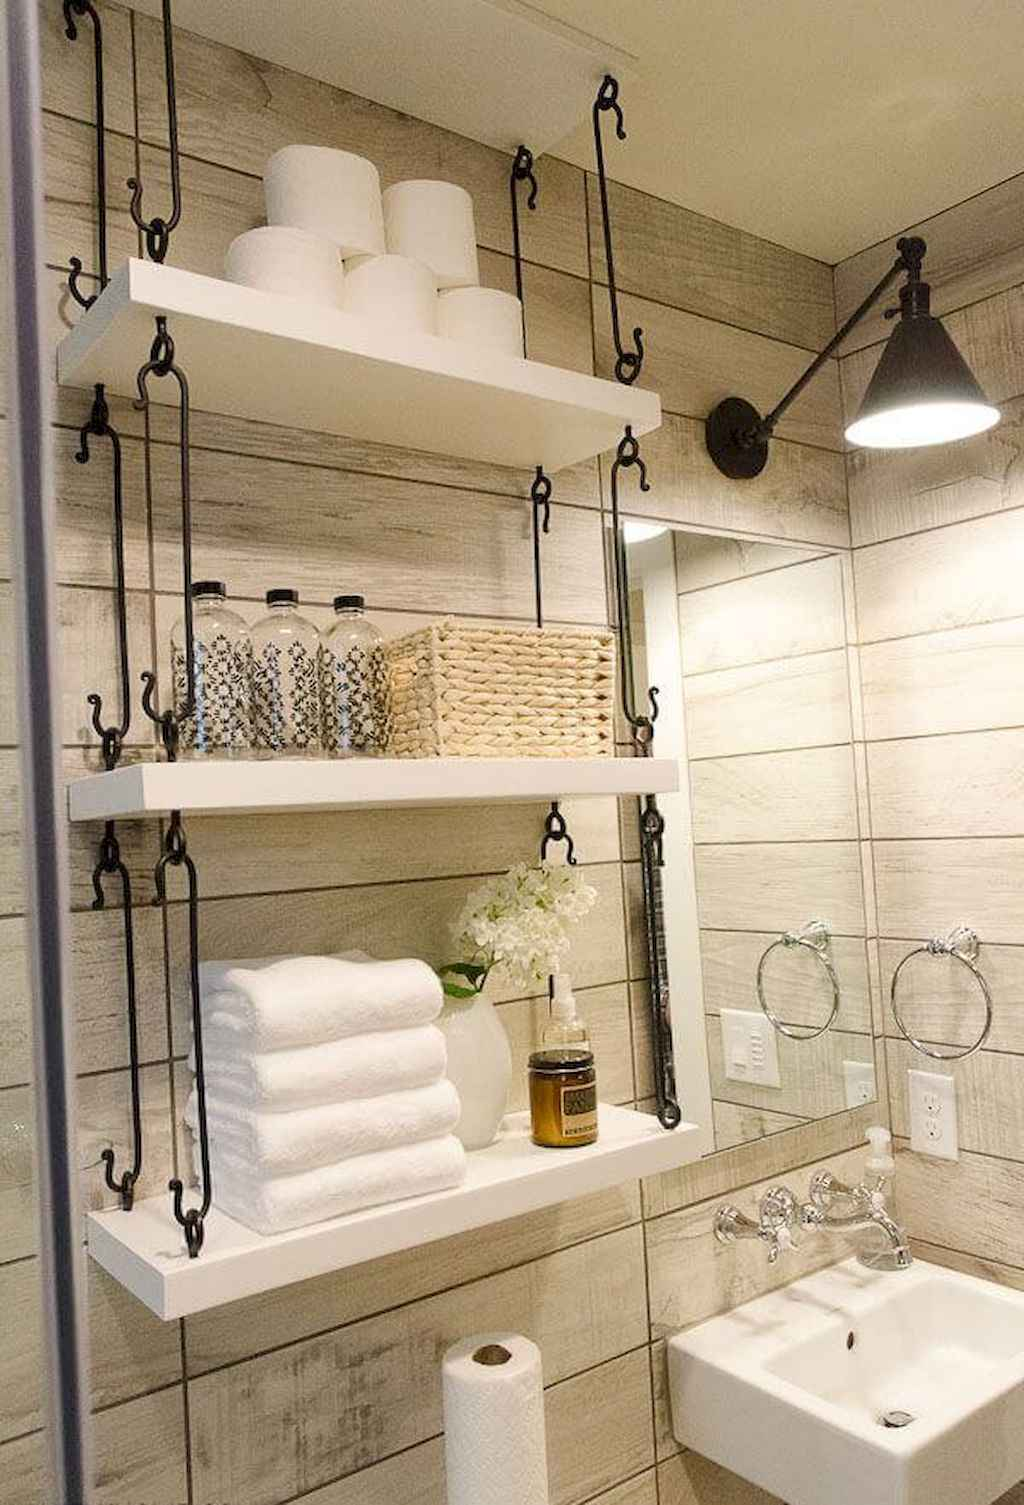 Cool bathroom storage shelves organization ideas (62)